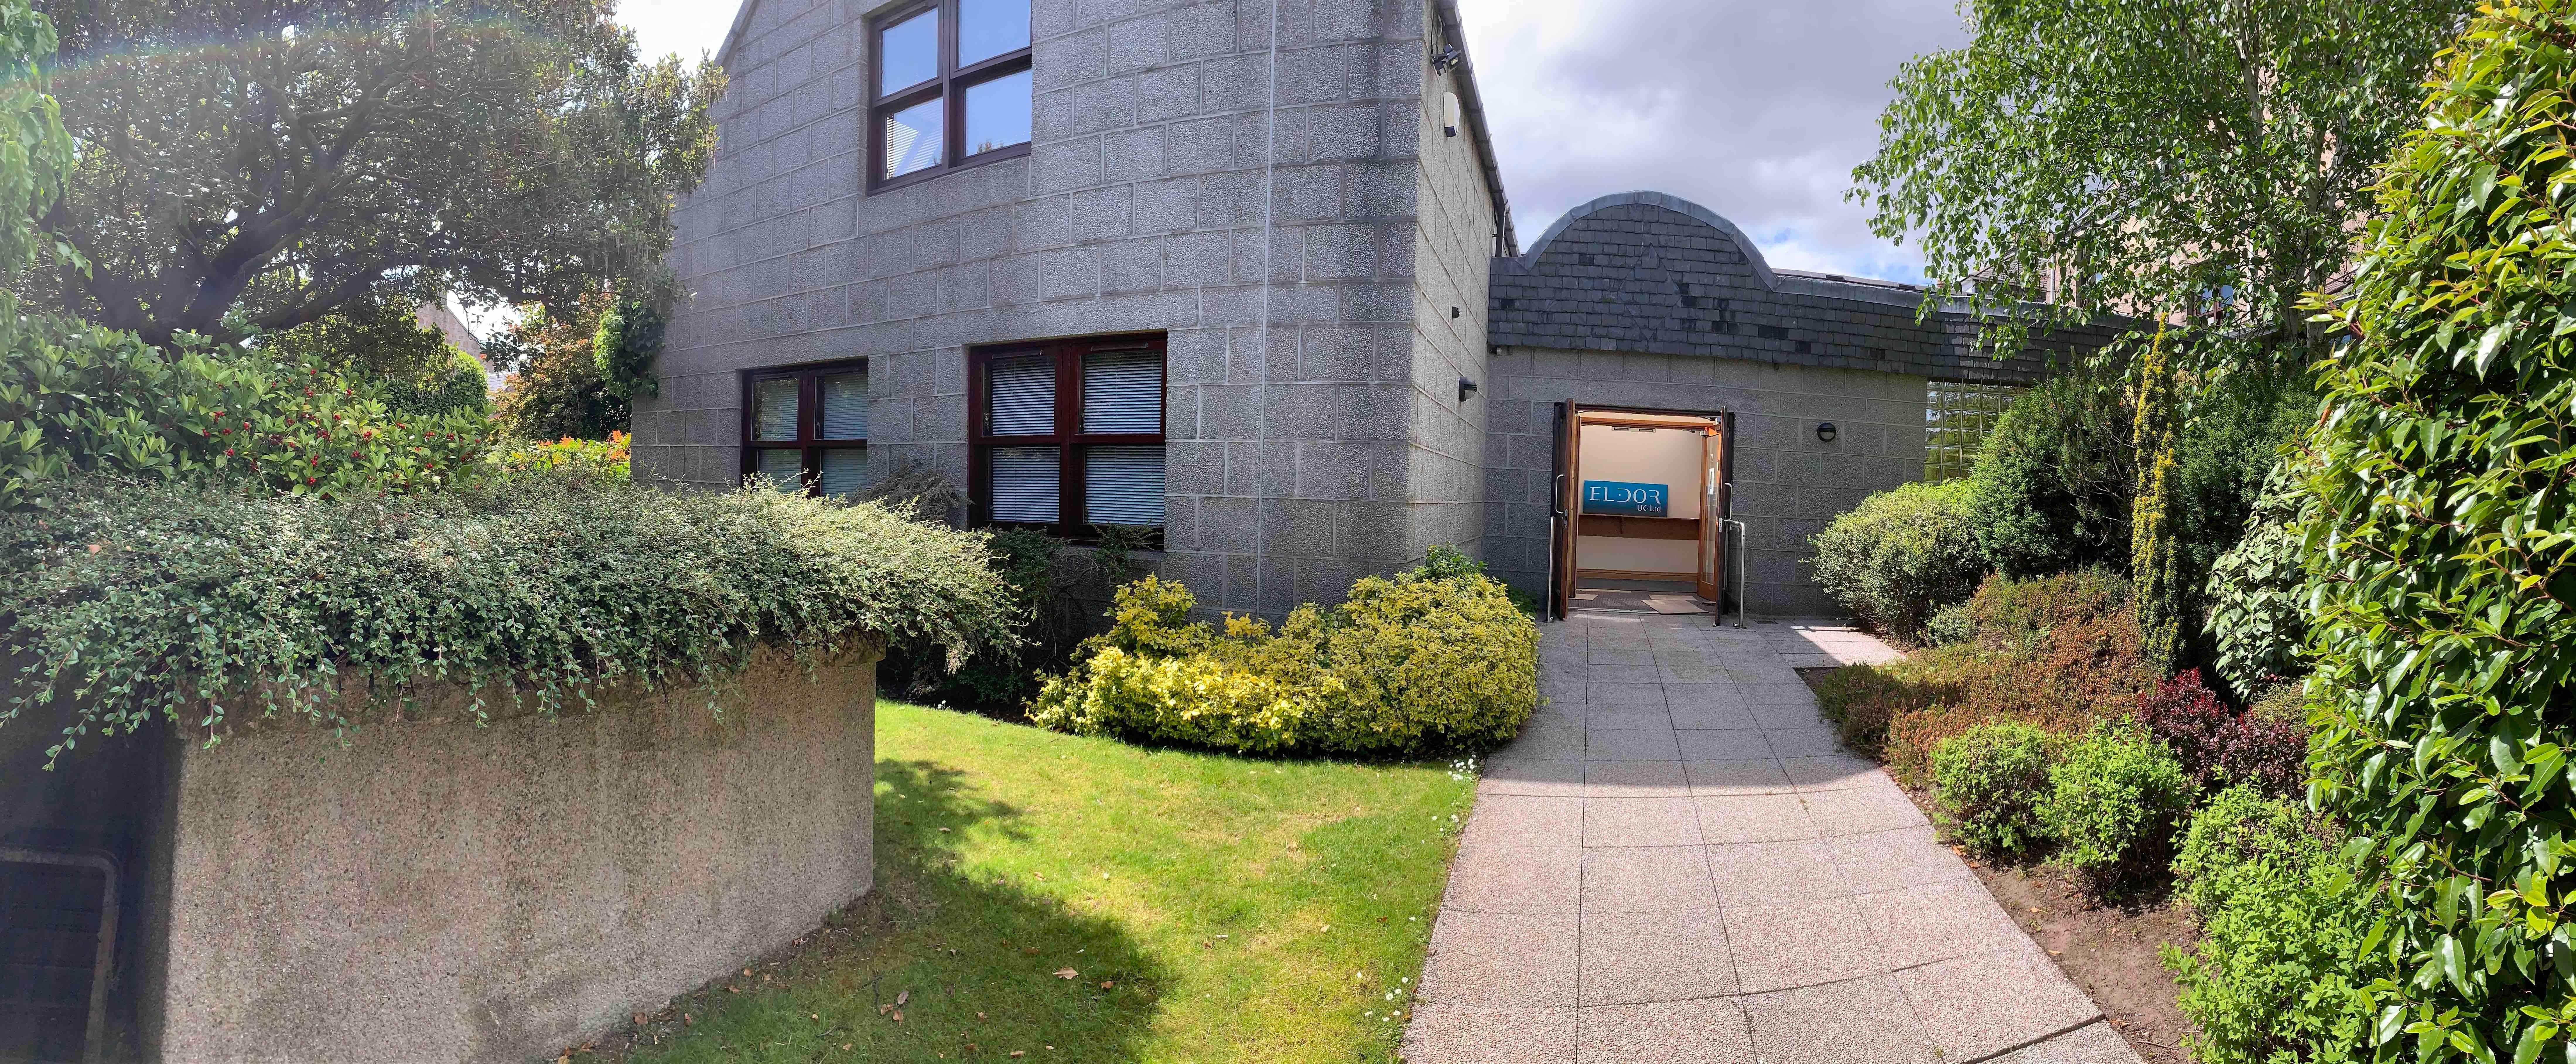 Eldor office Aberdeen UK